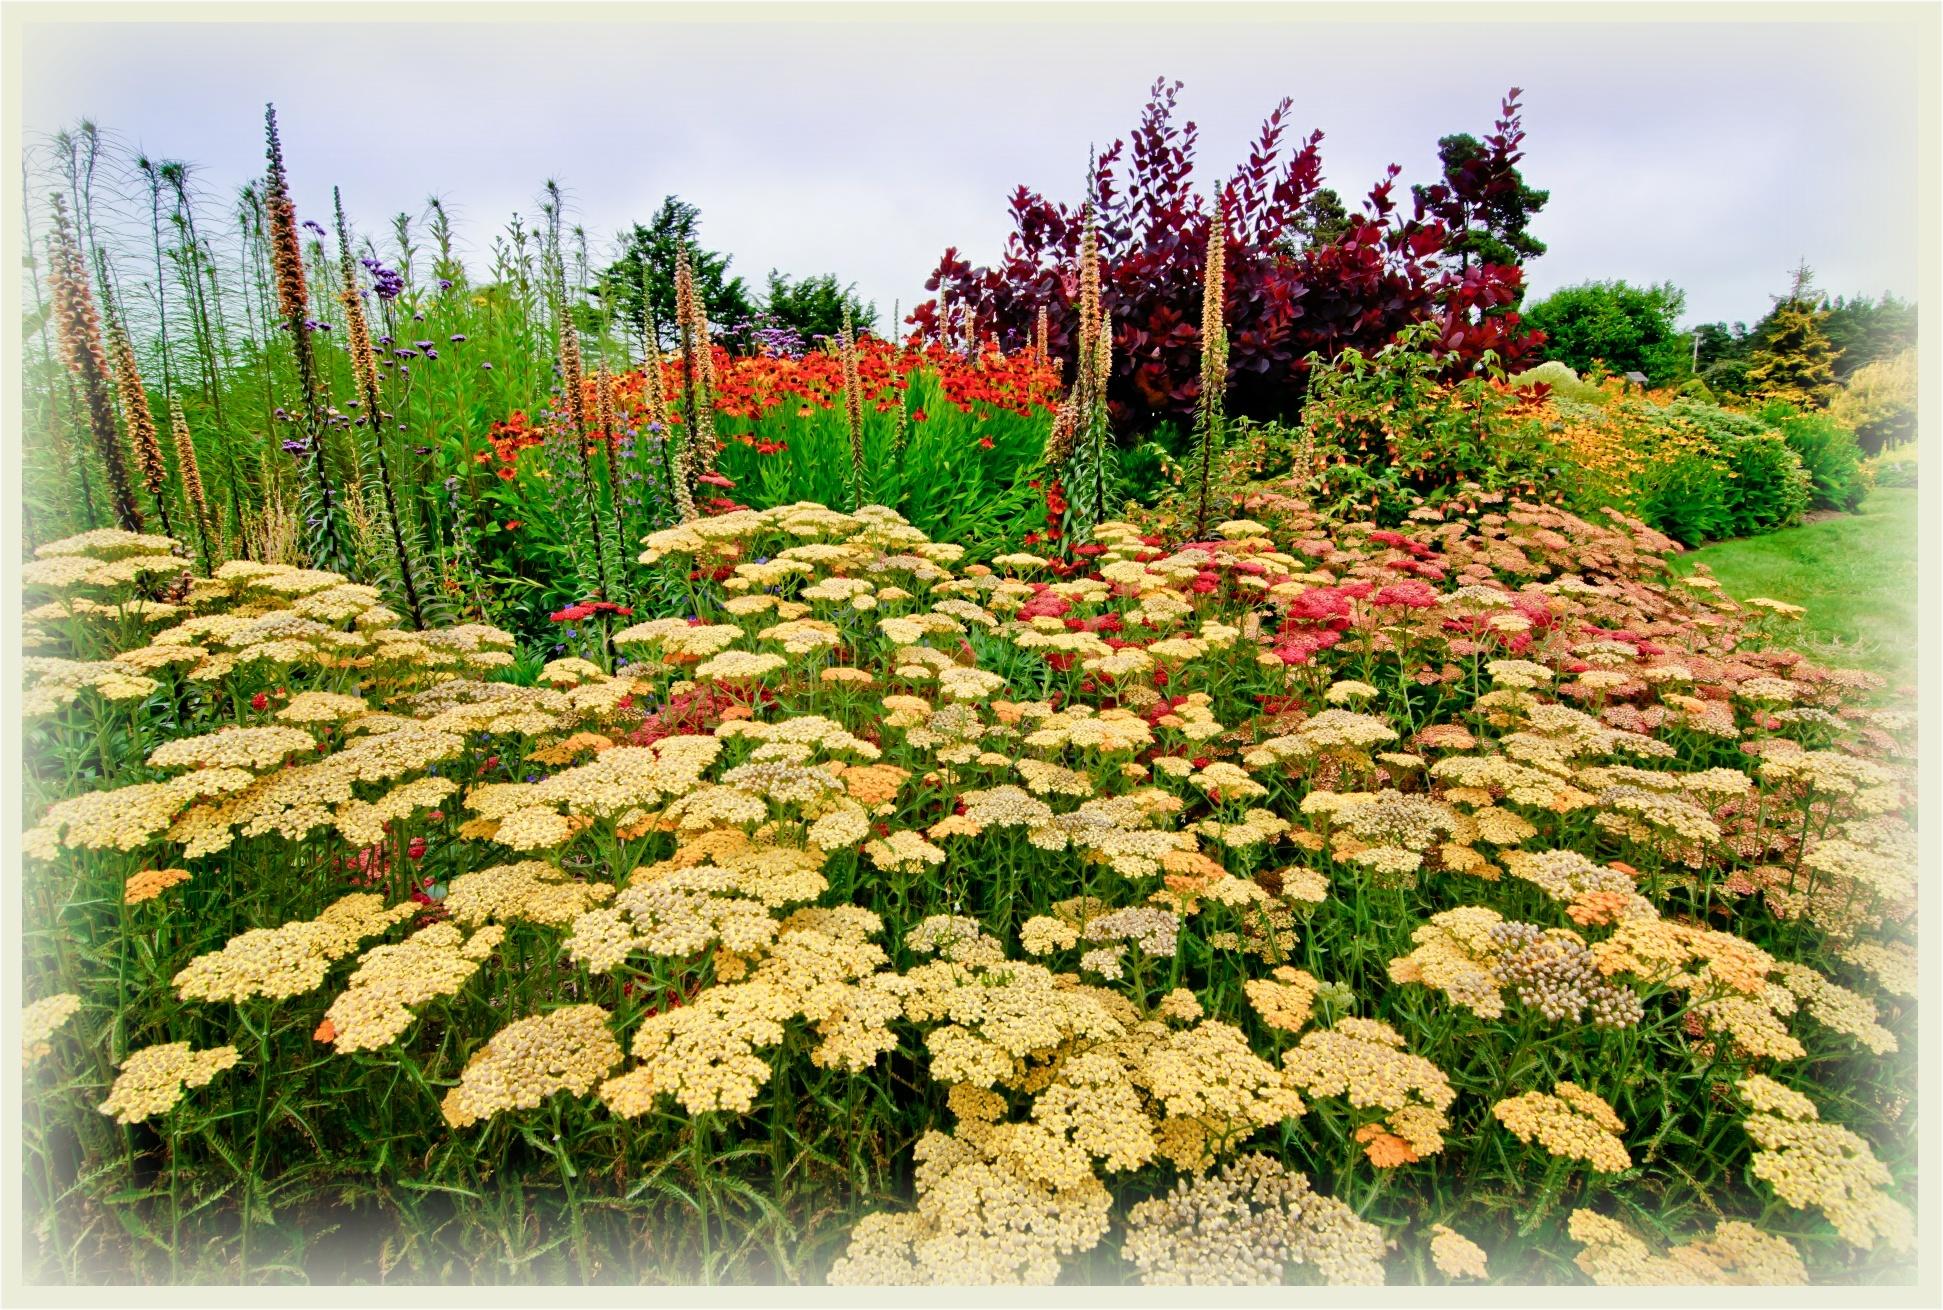 doug-pollard_yellow-flowers_parchment_bkgd_1943x1310